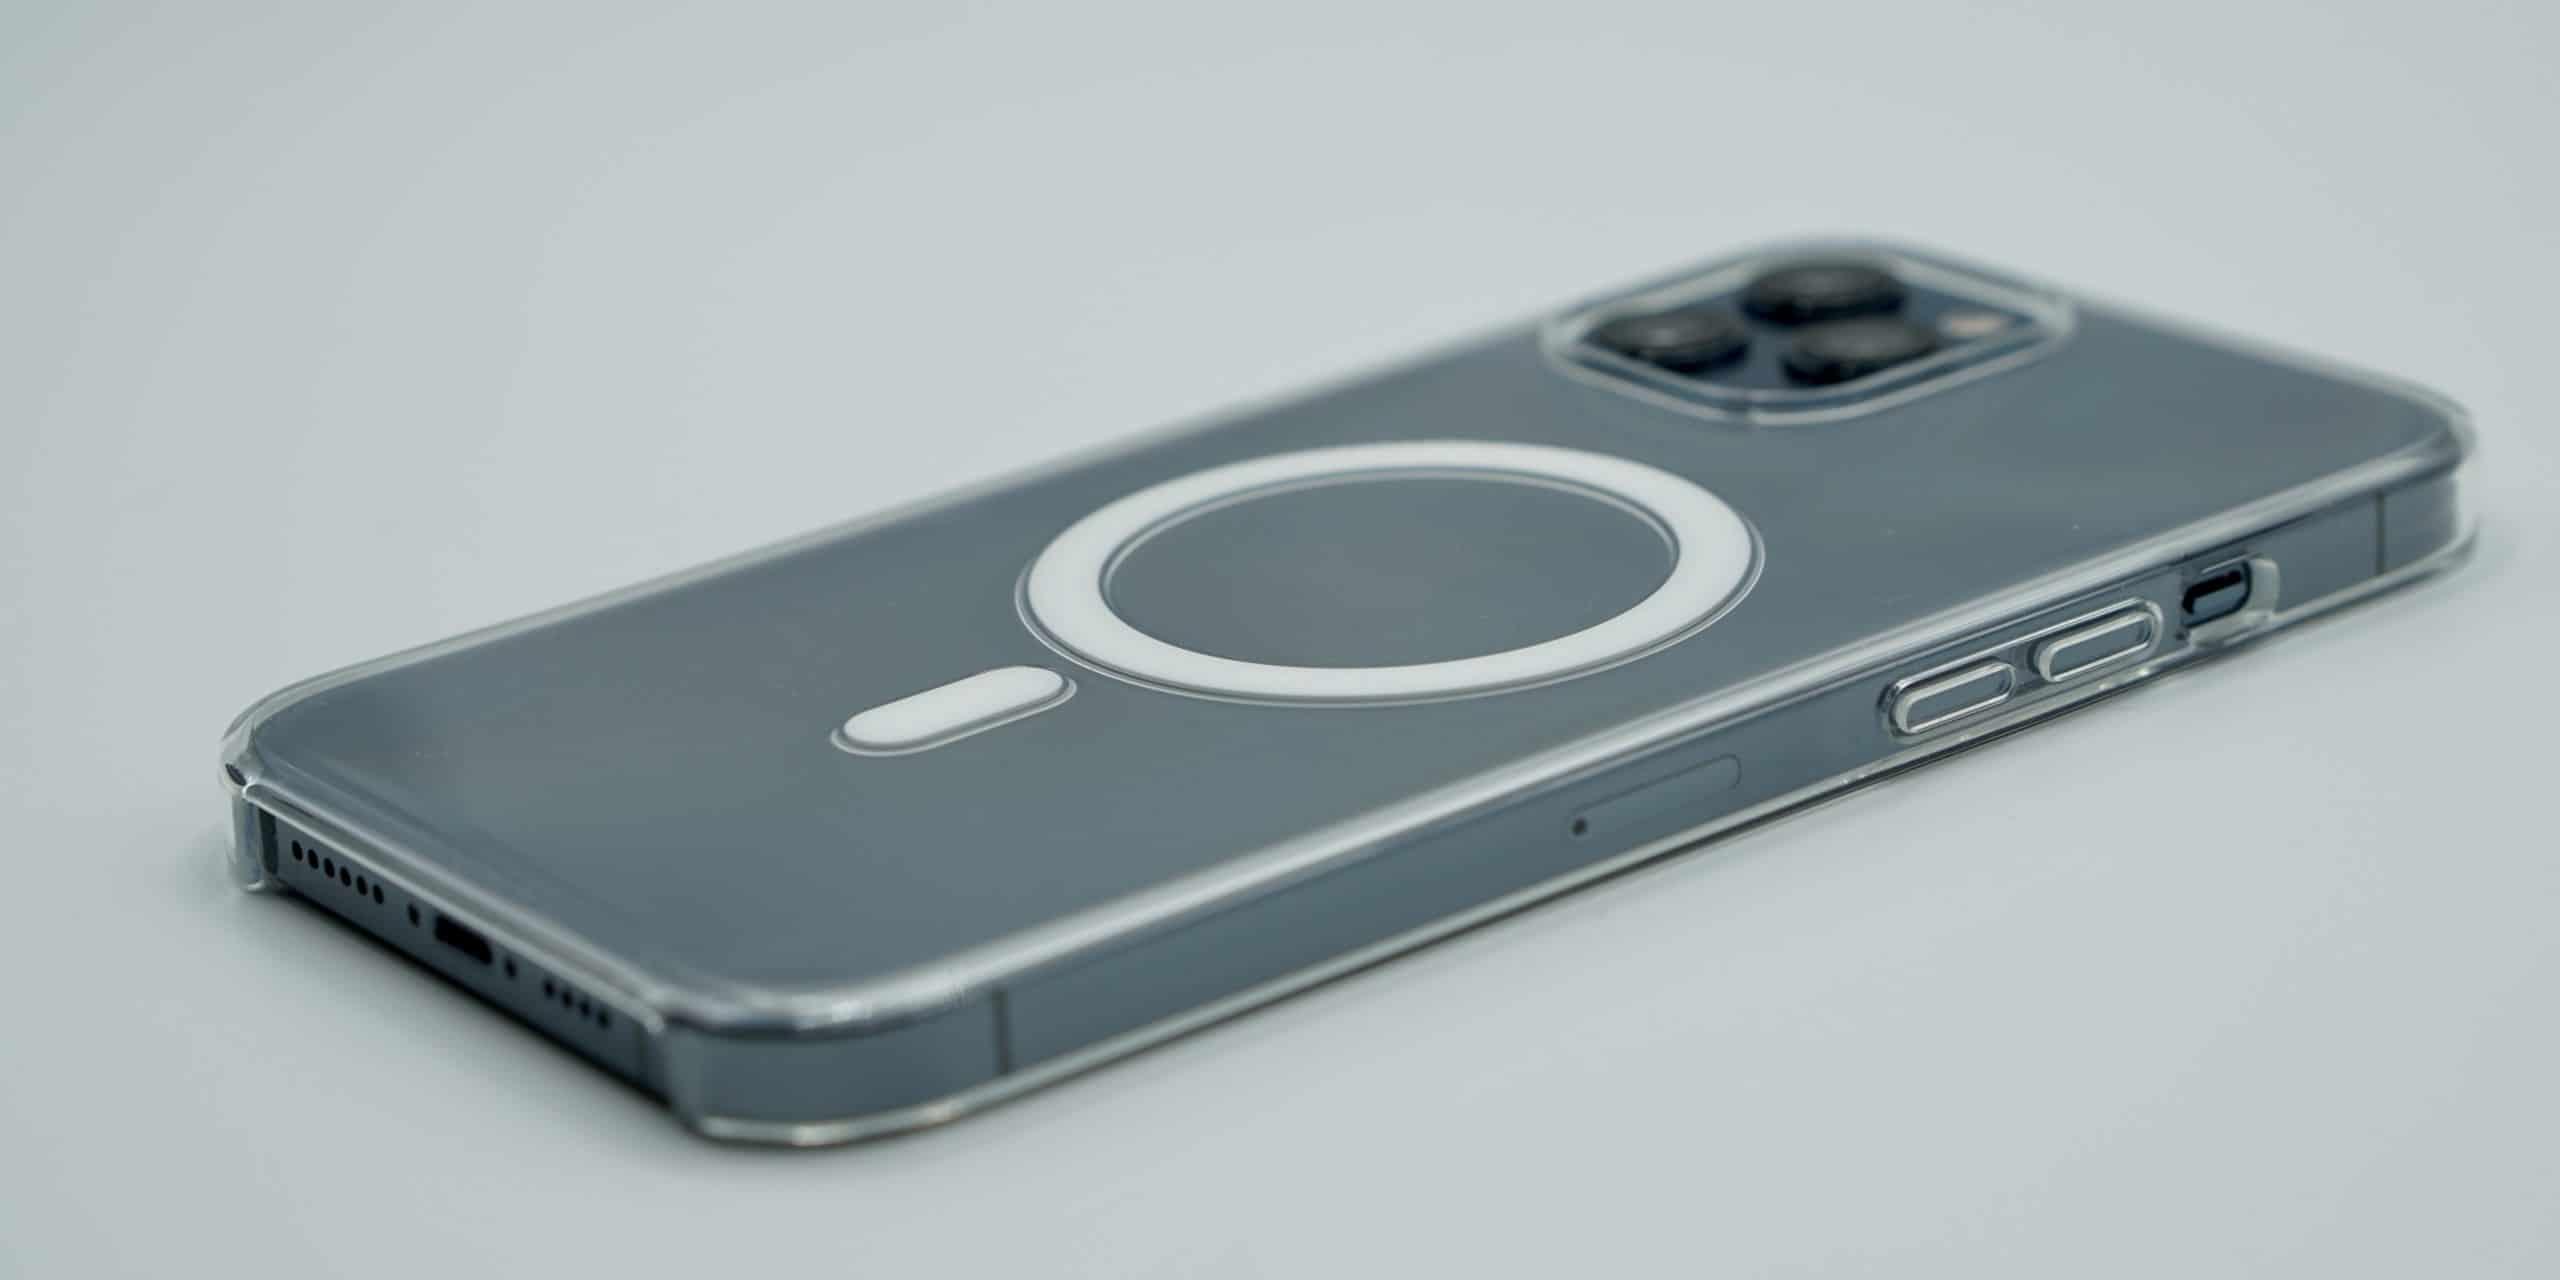 Funda transparente para el iPhone 12 Pro Max